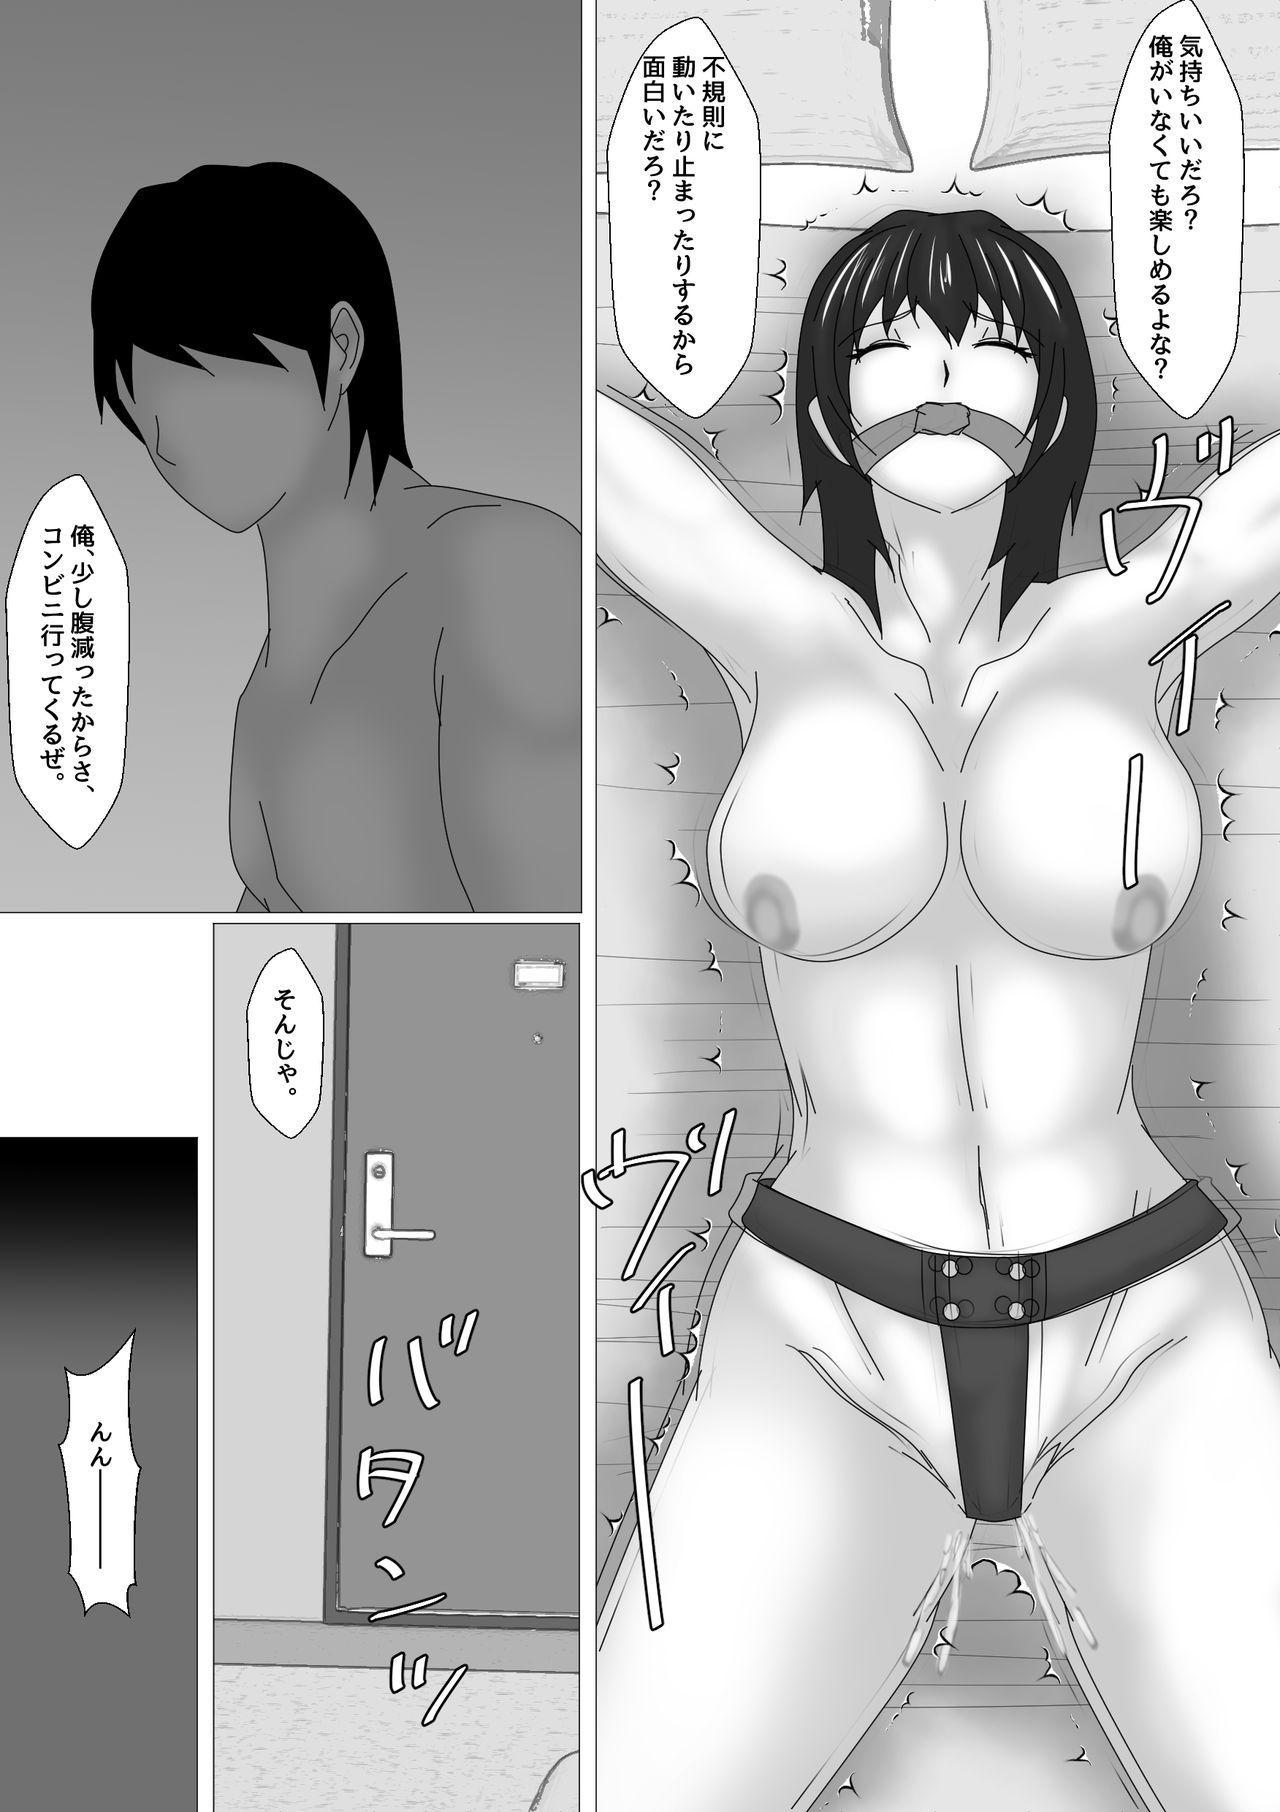 Jokyoushi Shinozaki Rin no Choukyou Kiroku Dai 2 | Female Teacher Rin Shinozaki's Training Record 2 31